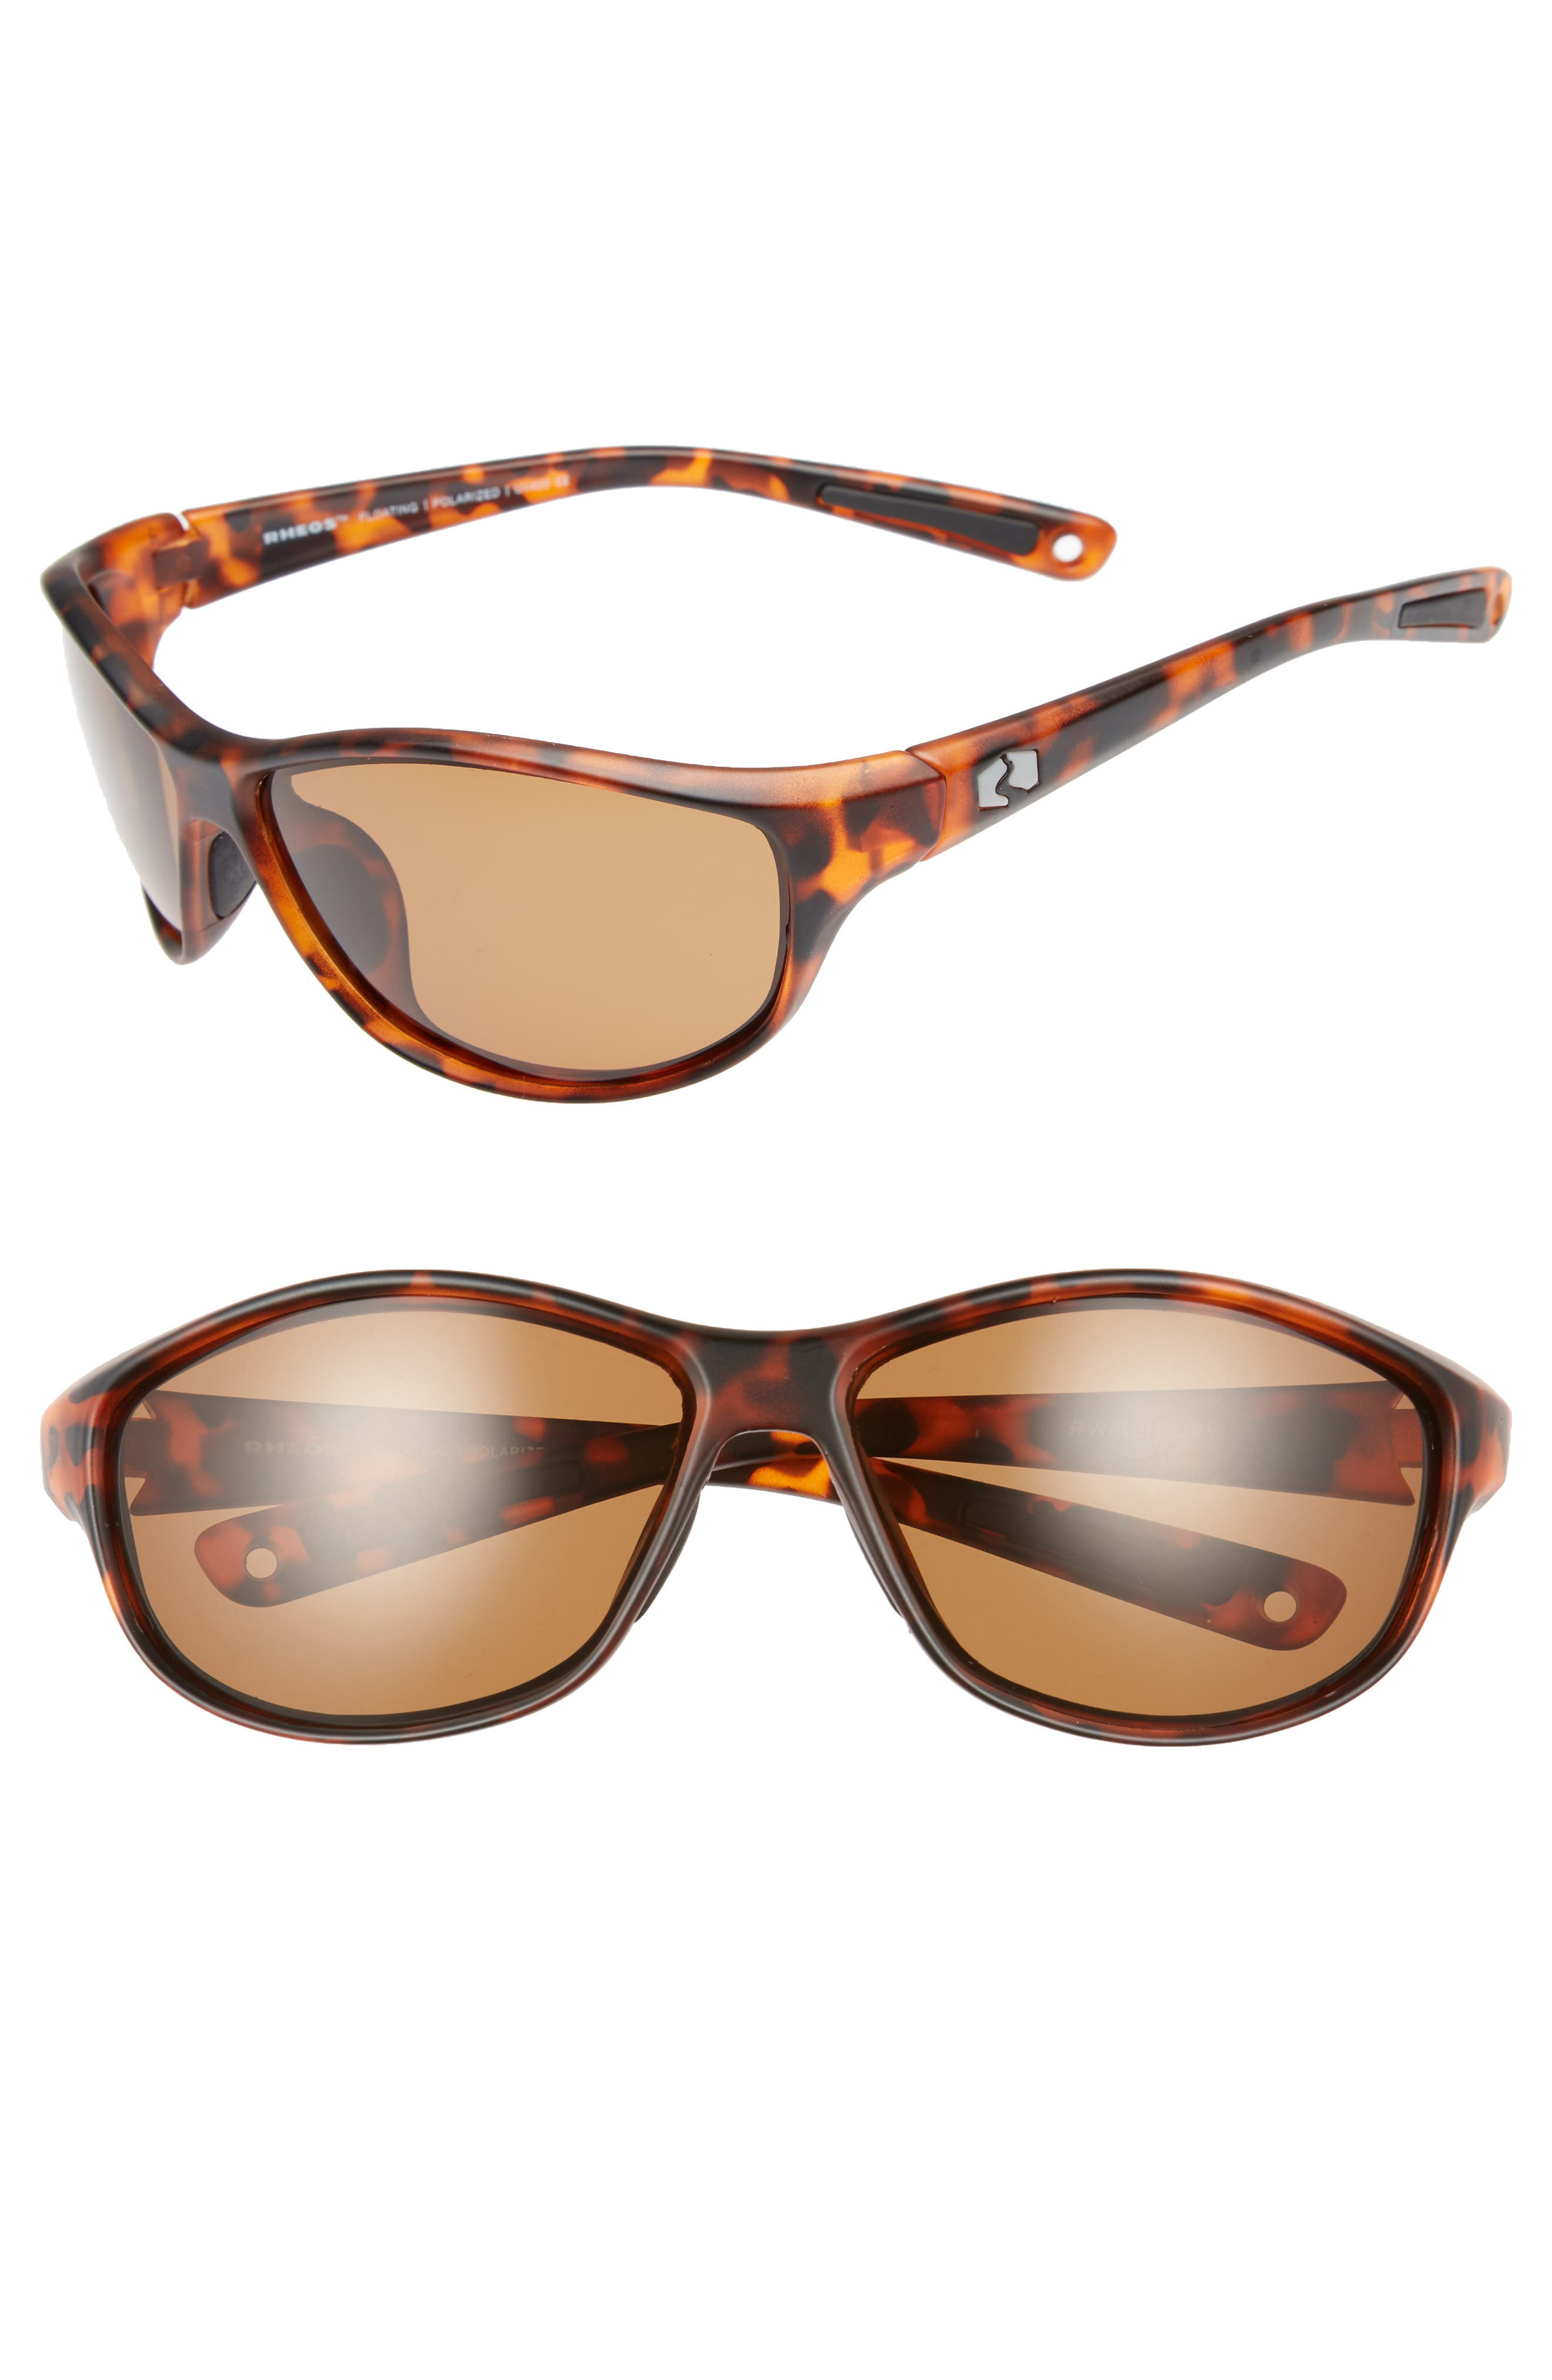 Bahias Floating 60mm Polarized Sunglasses,                         Main,                         color, Tortoise / Amber